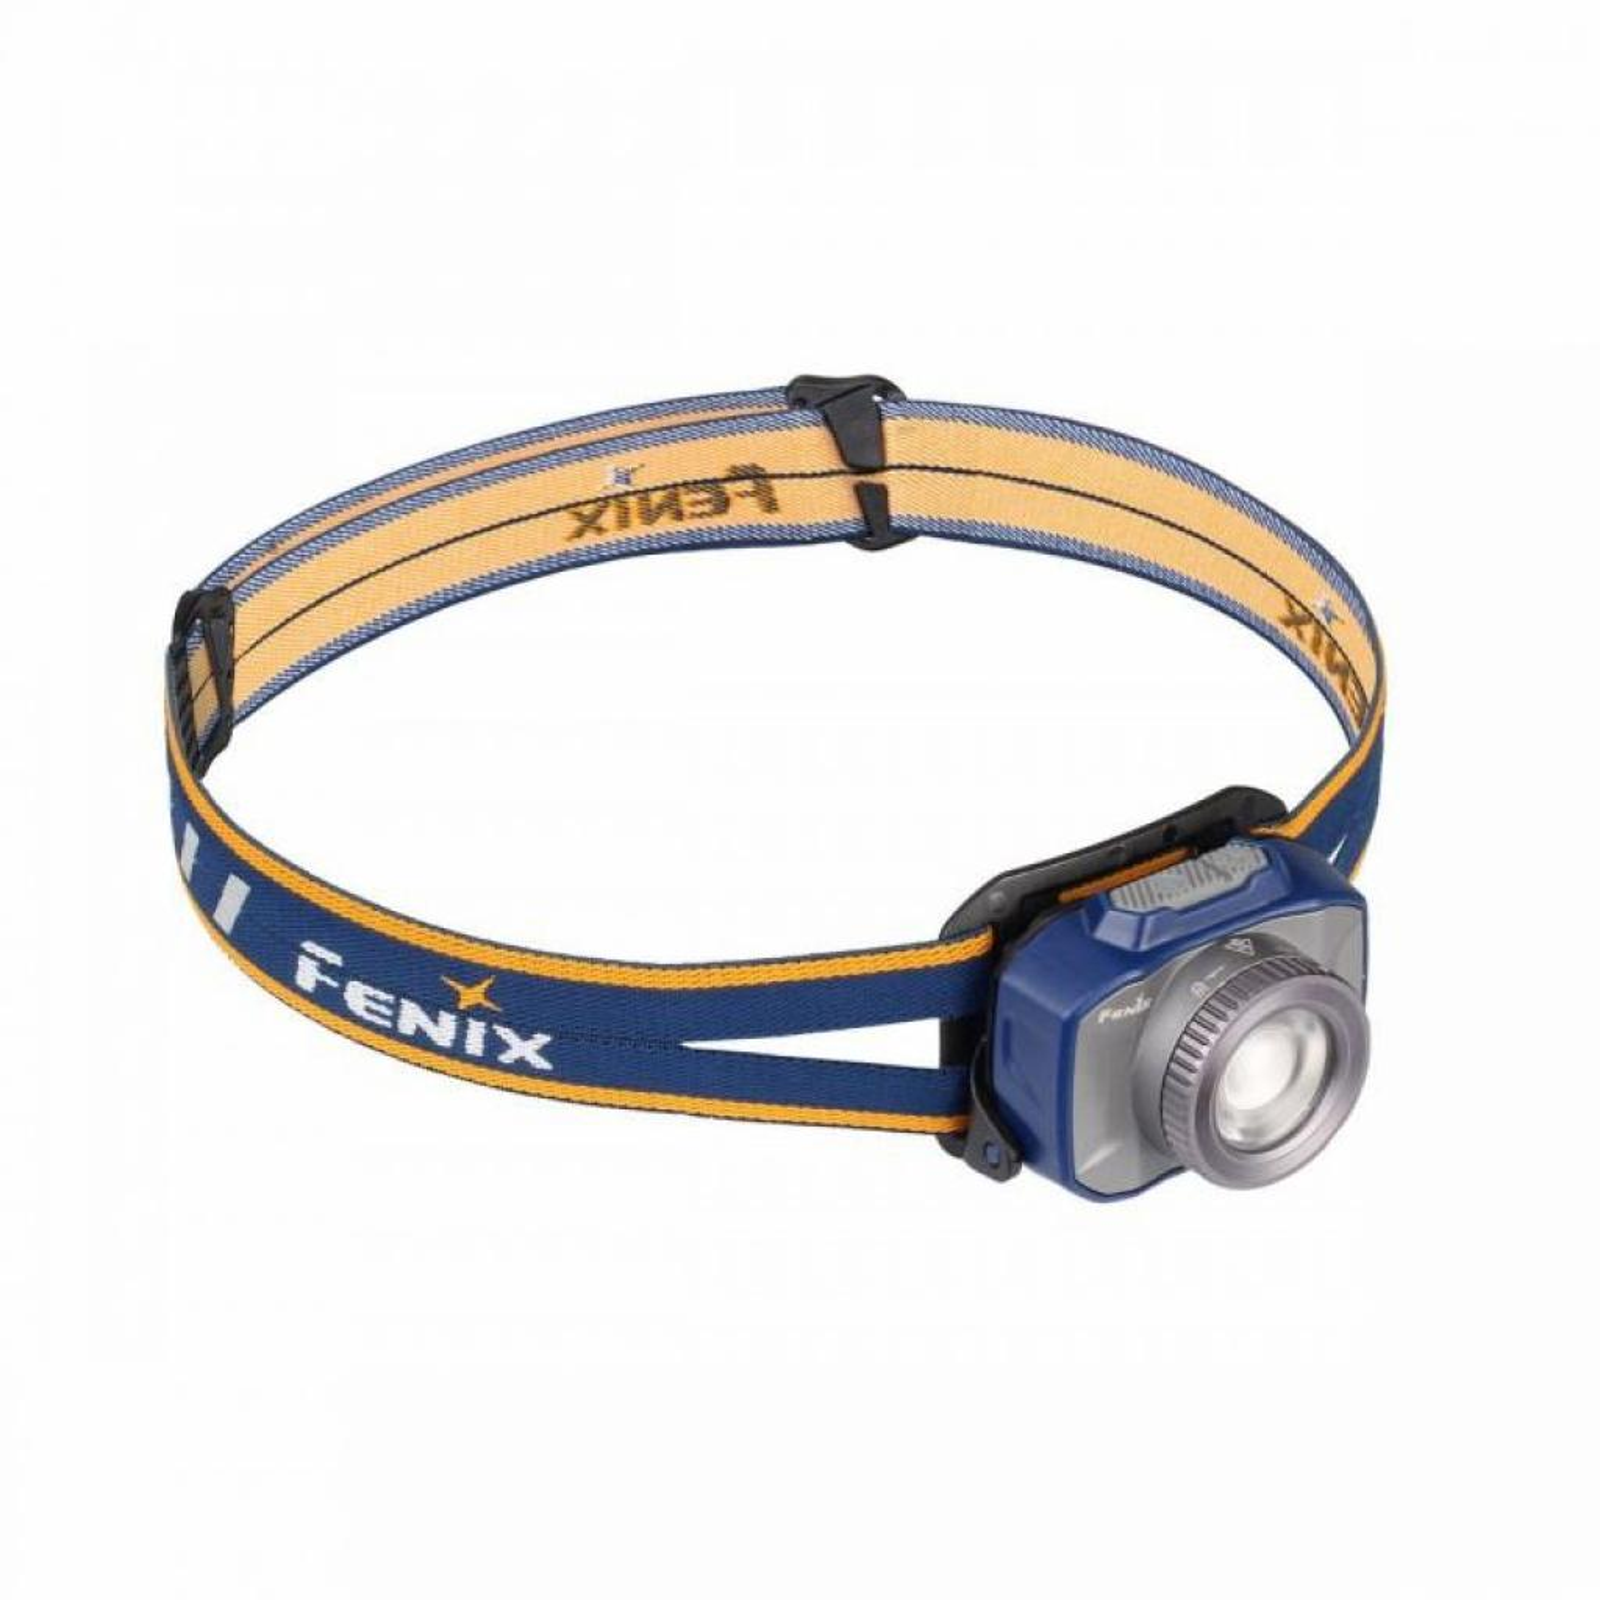 Фонарь Fenix HL40R Cree XP-LHIV2 LED синий (HL40RBL) изображение 3